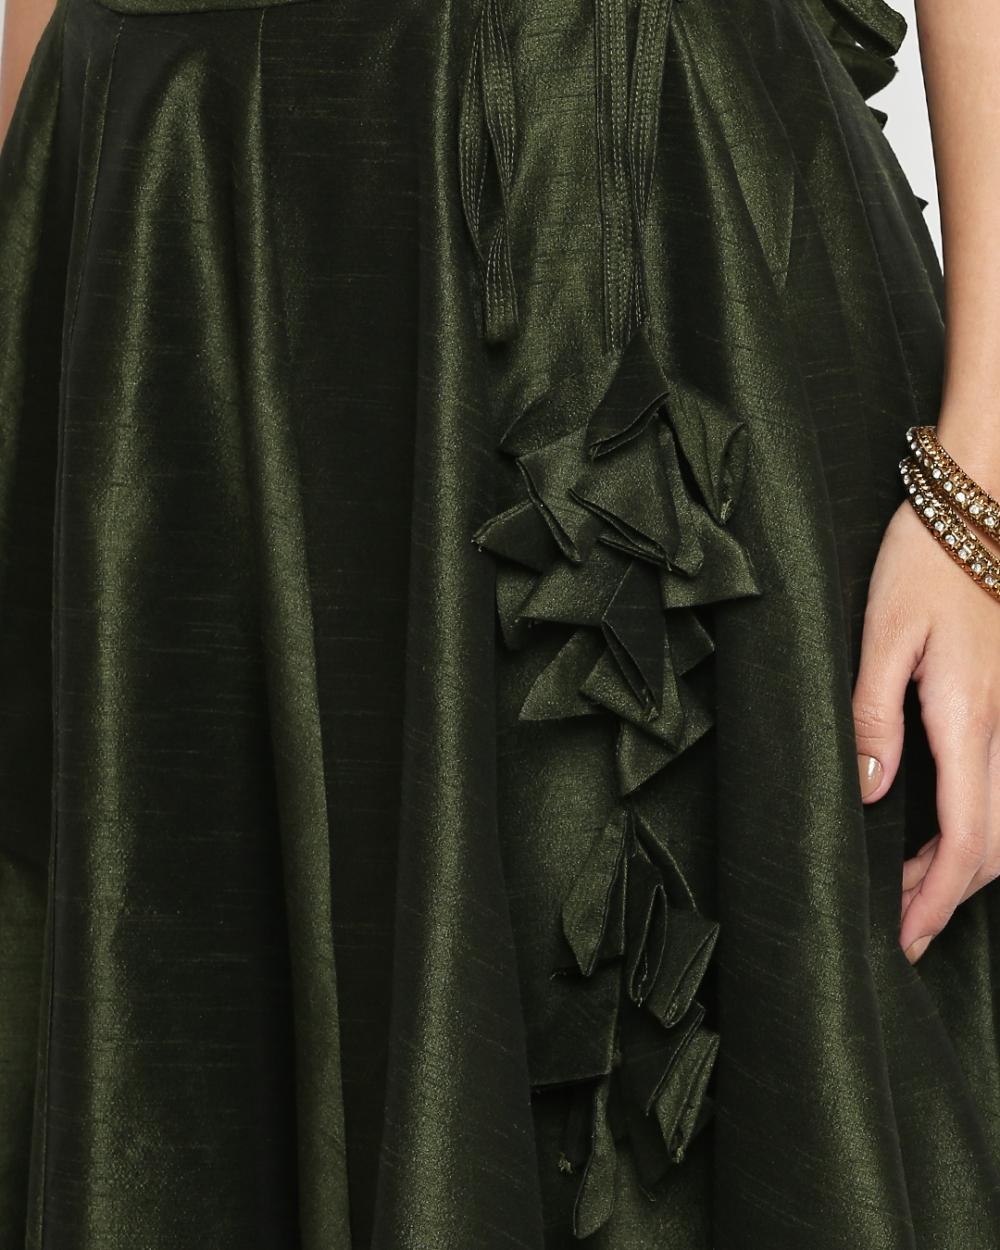 Moss Green Raw Silk Lehenga - Fashion Brand & Designer Priti Sahni 6